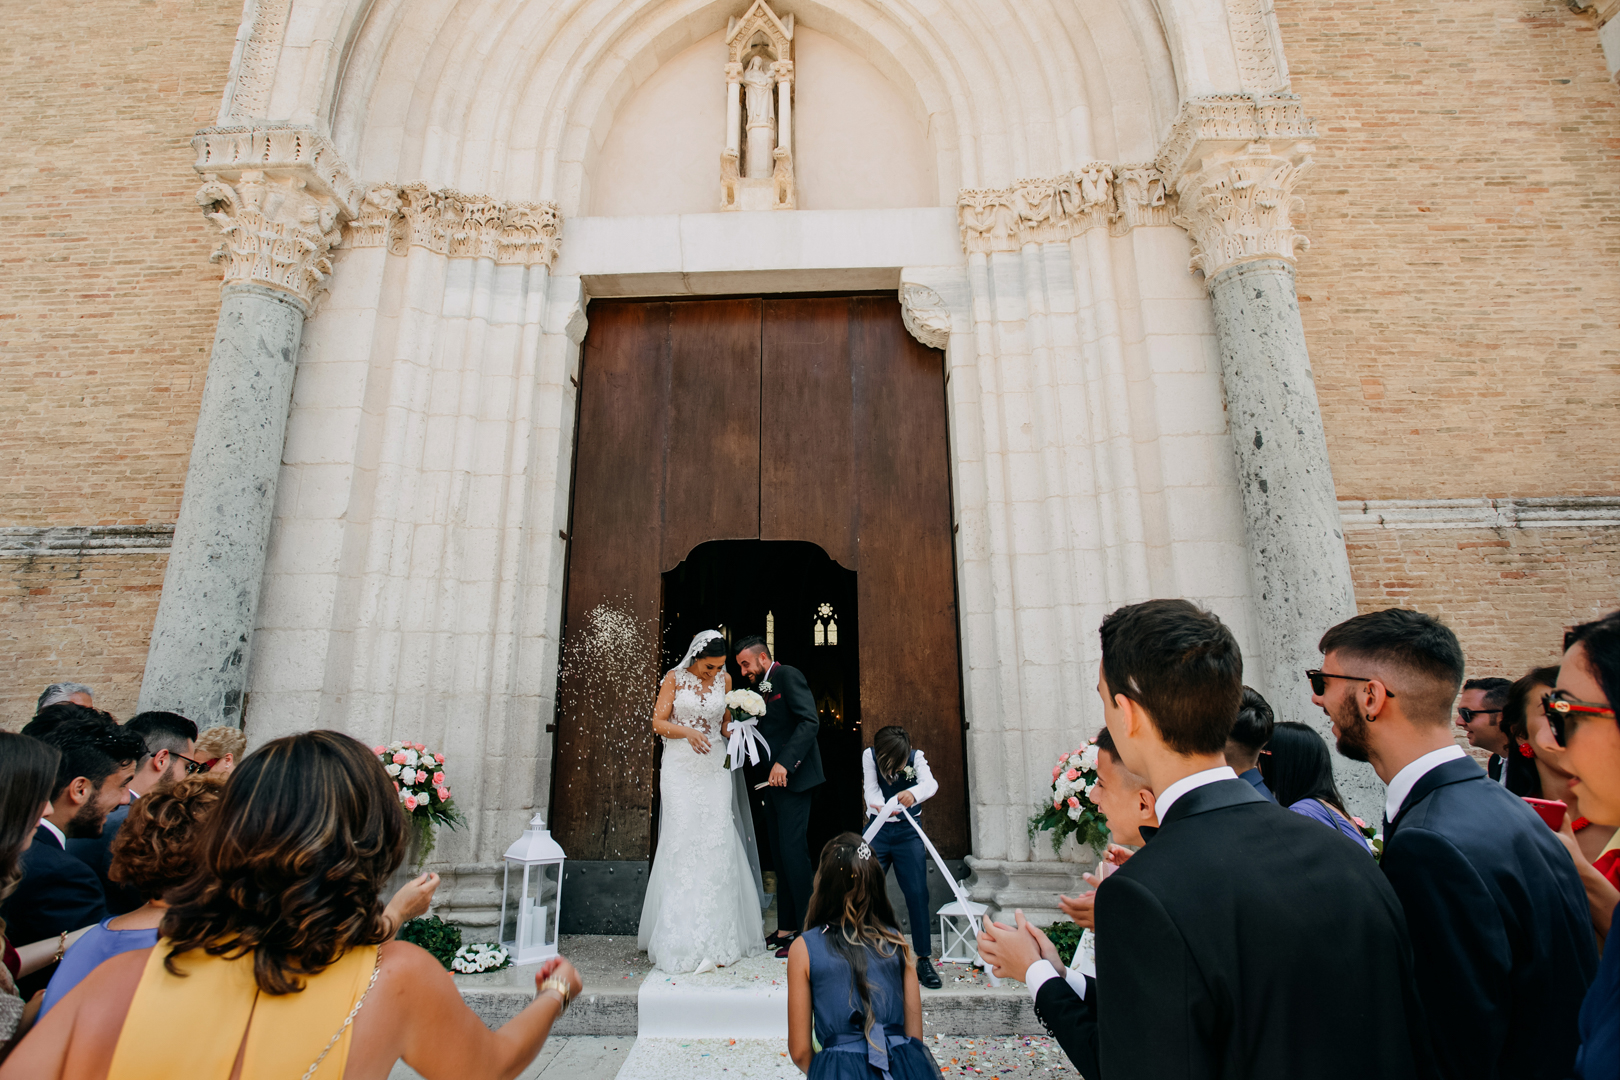 38 gianni-lepore-weddingday-uscita-chiesa-church-italia-lucera